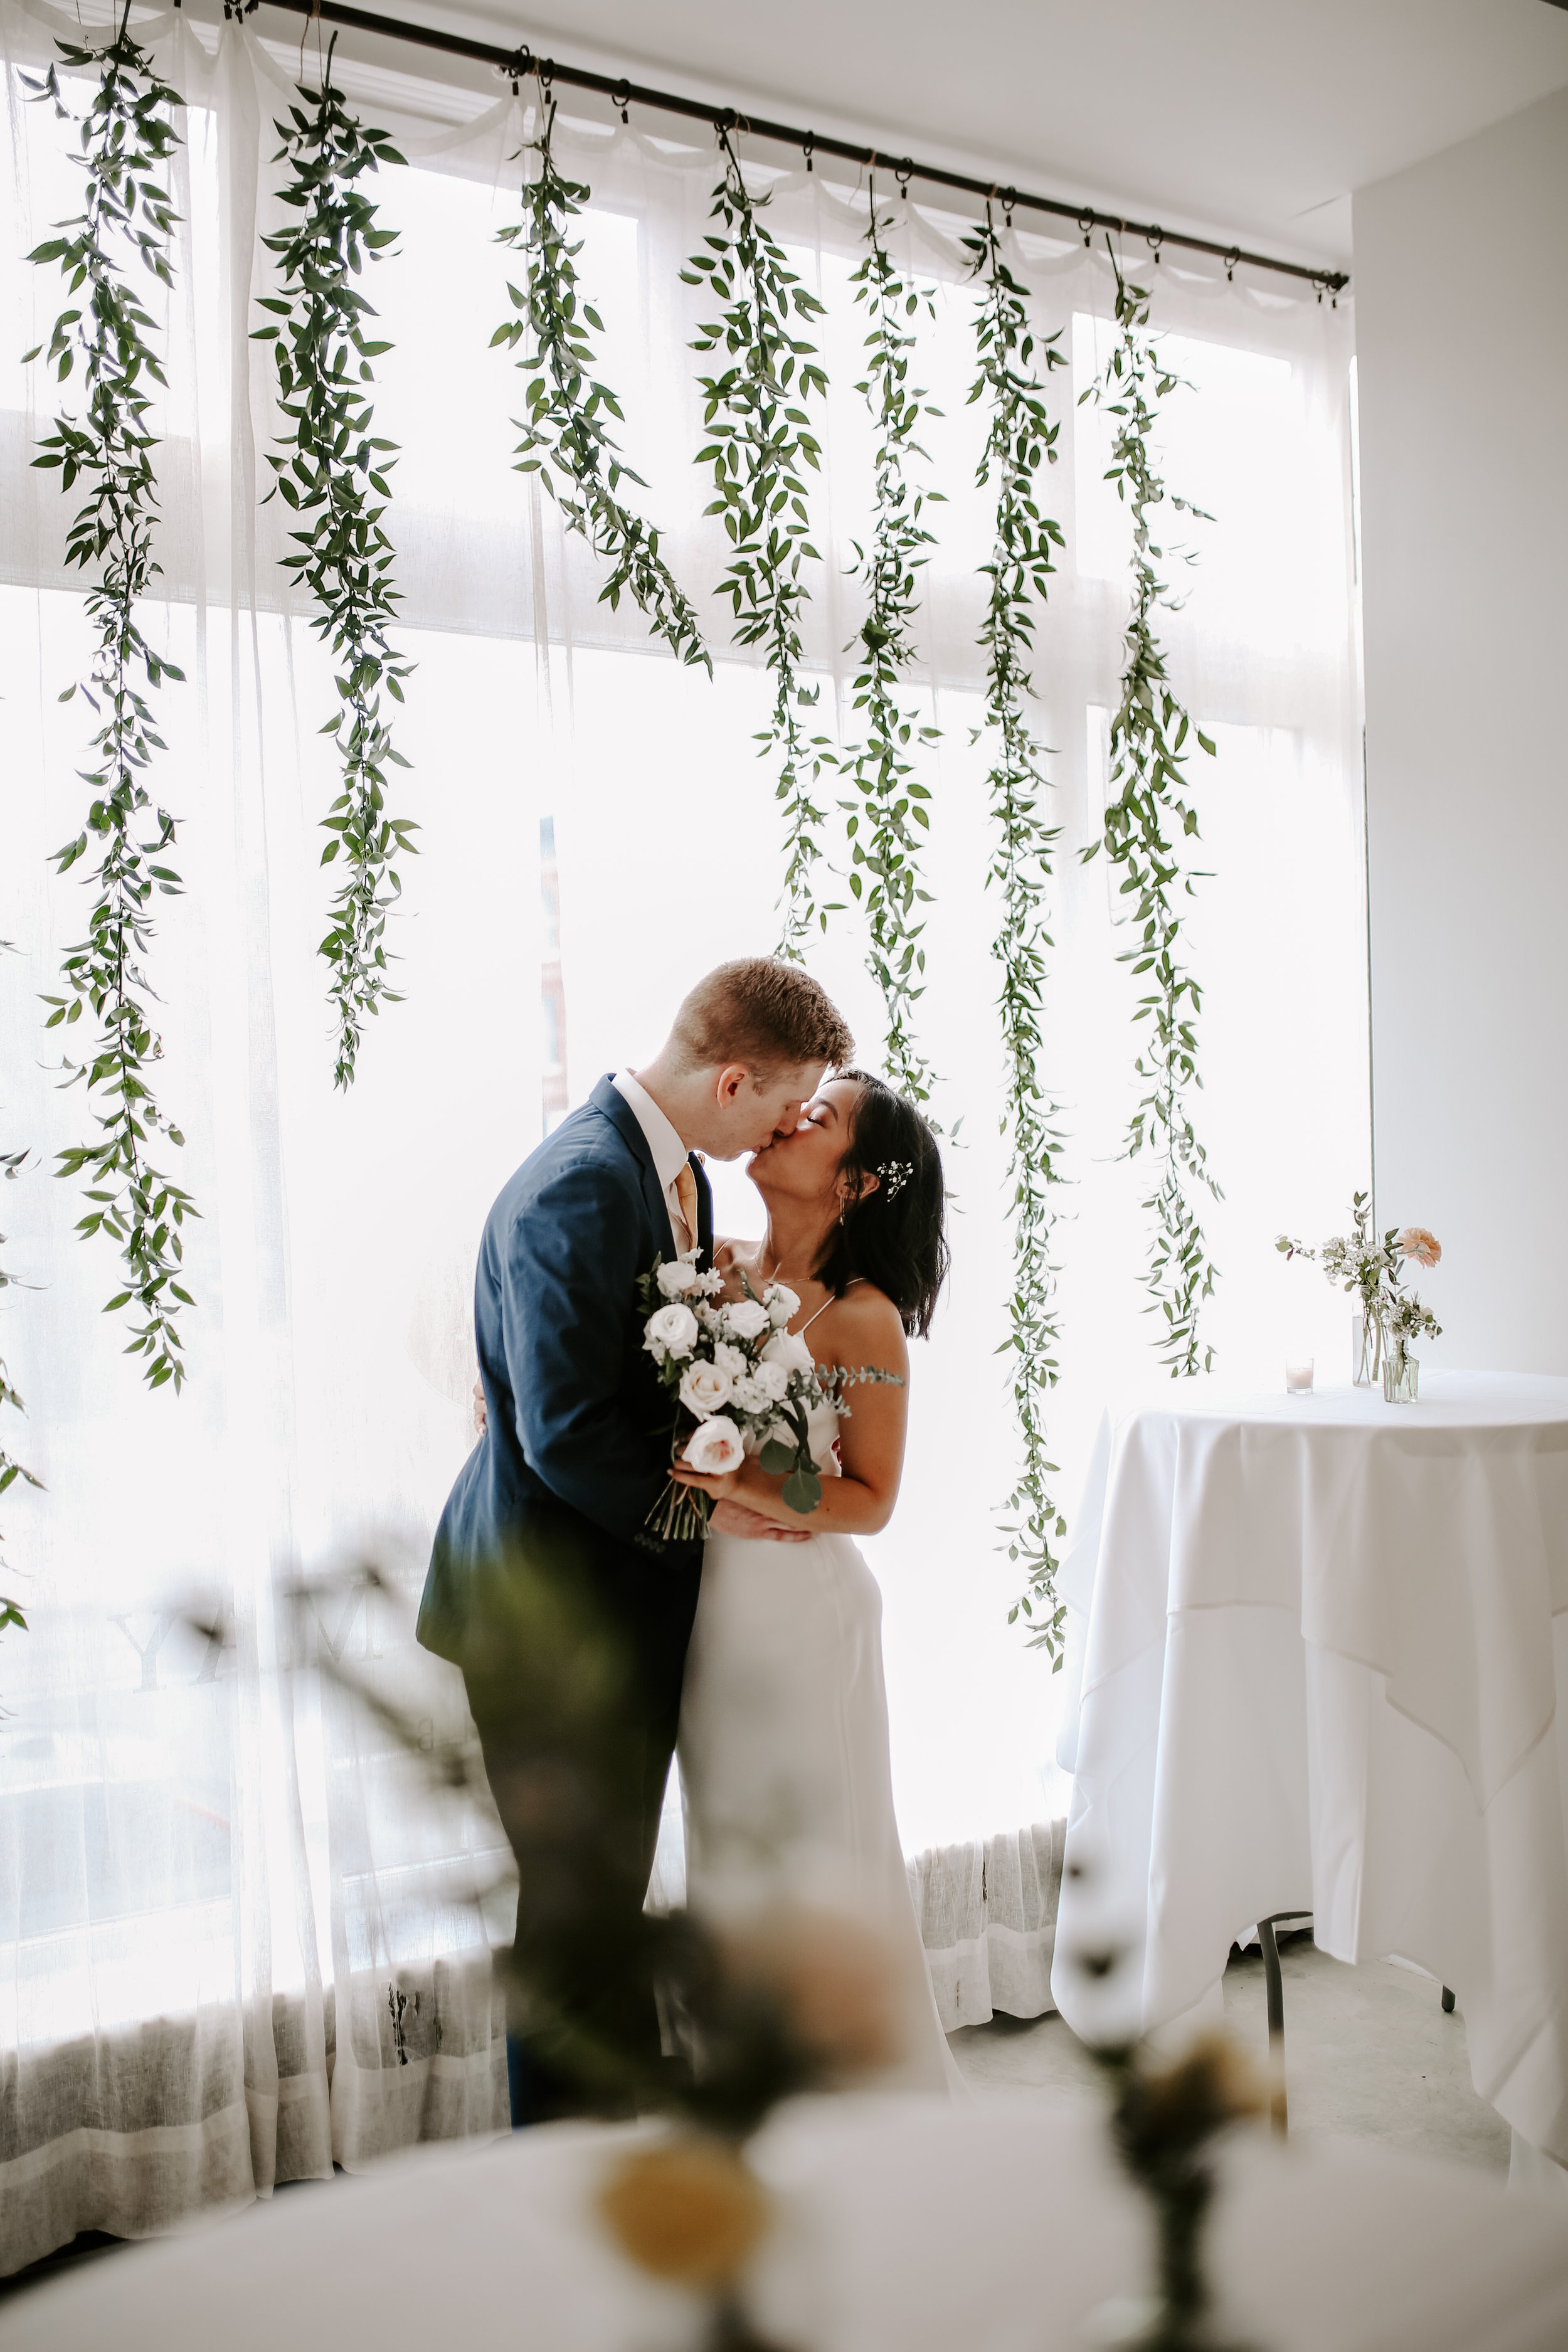 TheNichols_Married_2019-126.jpg